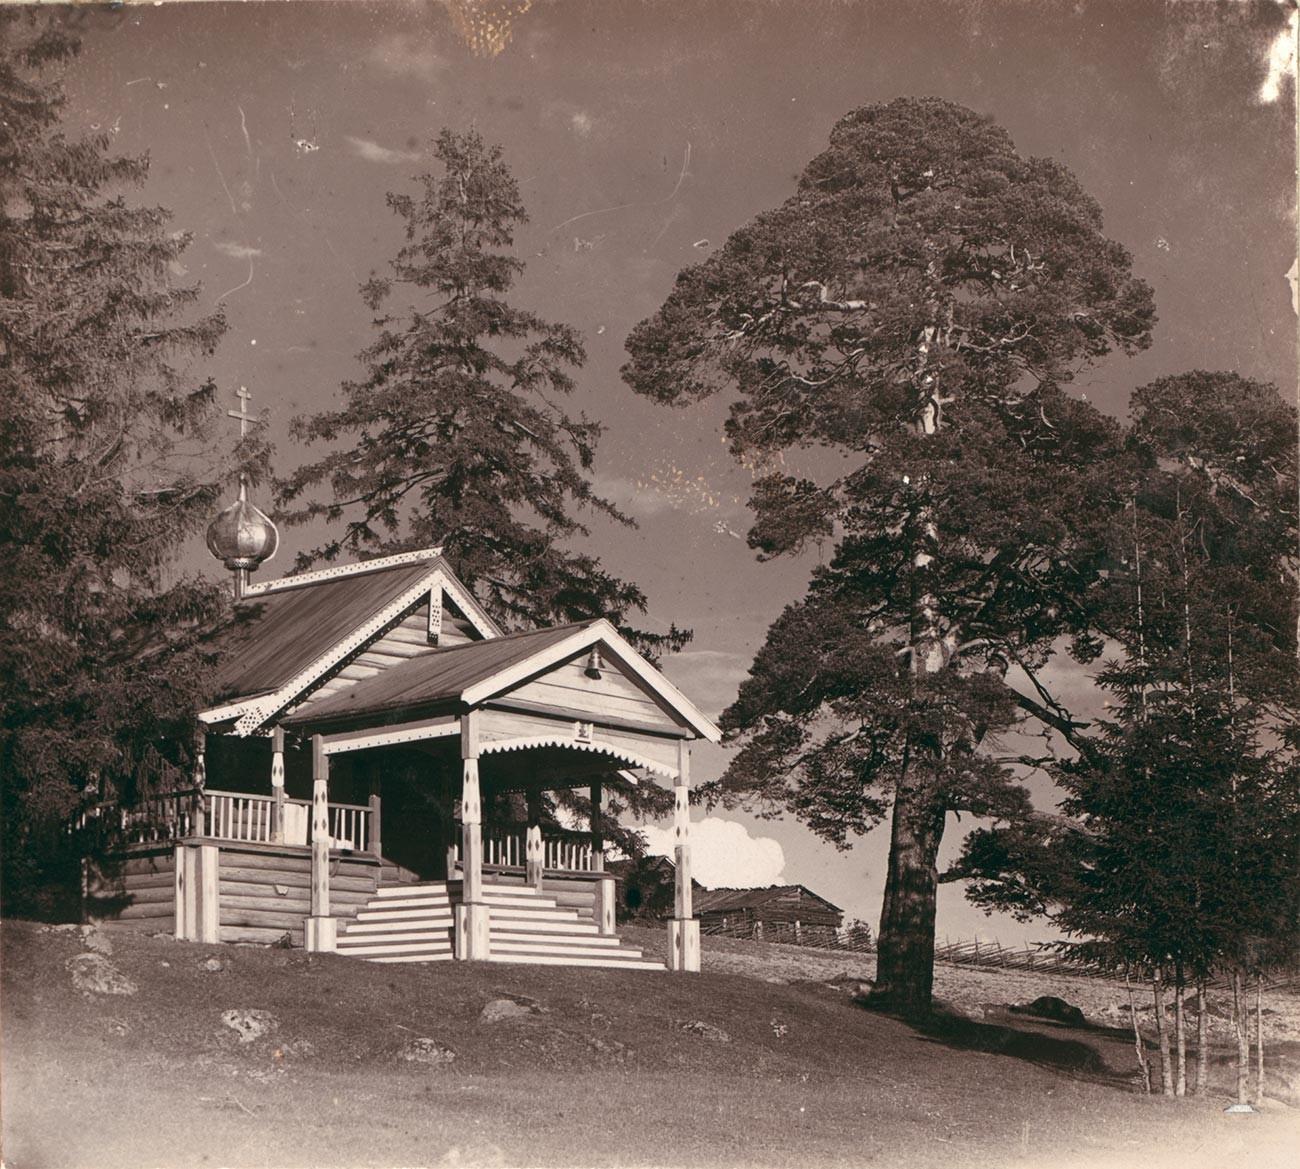 Vas Materiki. Kapela sv. Paraskeve Pjatnice (sv. Petke) - manjka originalni negativ na stekleni plošči. Poletje 1909